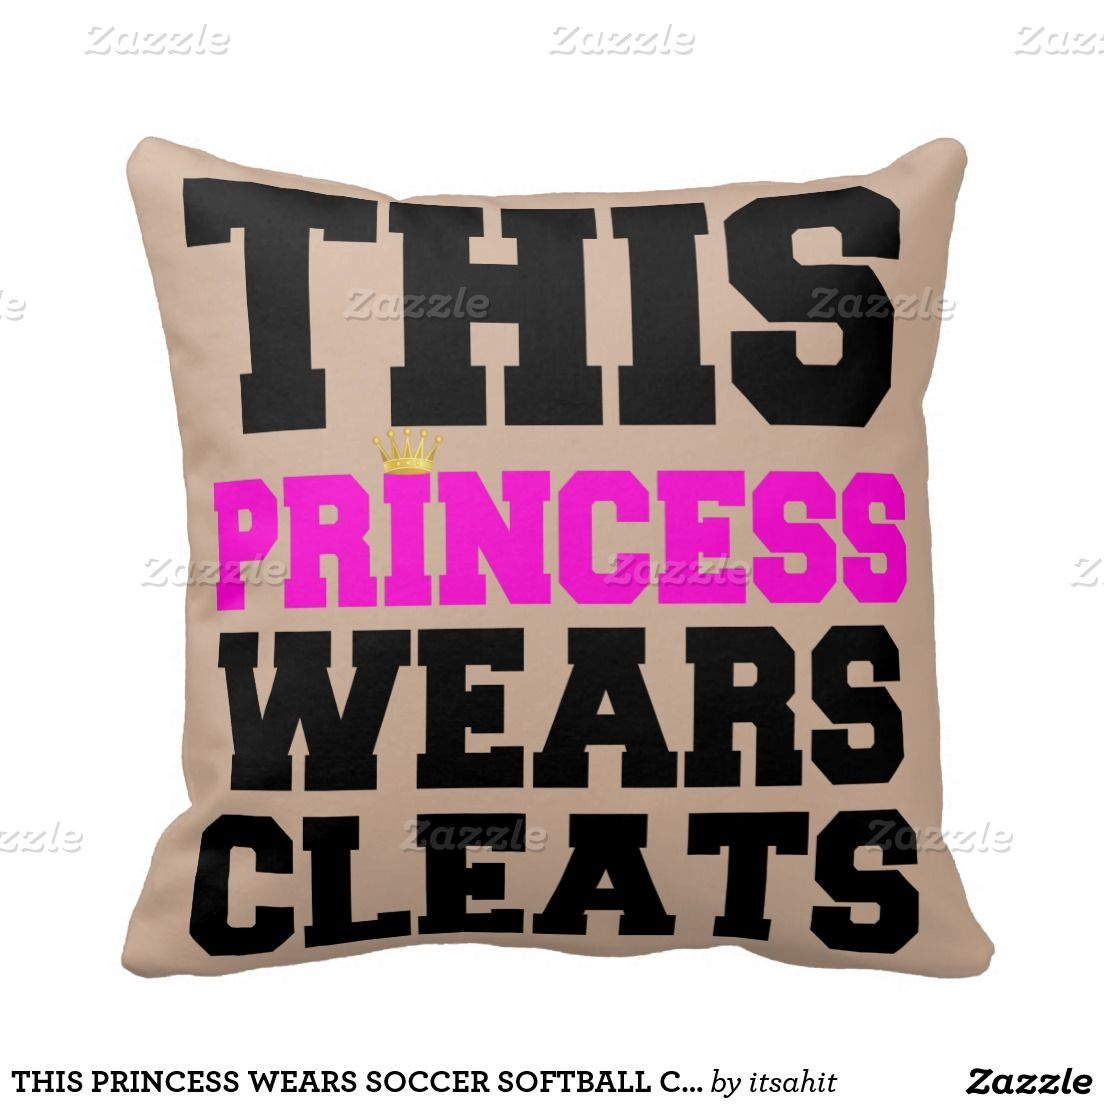 This Princess Wears Soccer Softball Cleats Throw Pillow